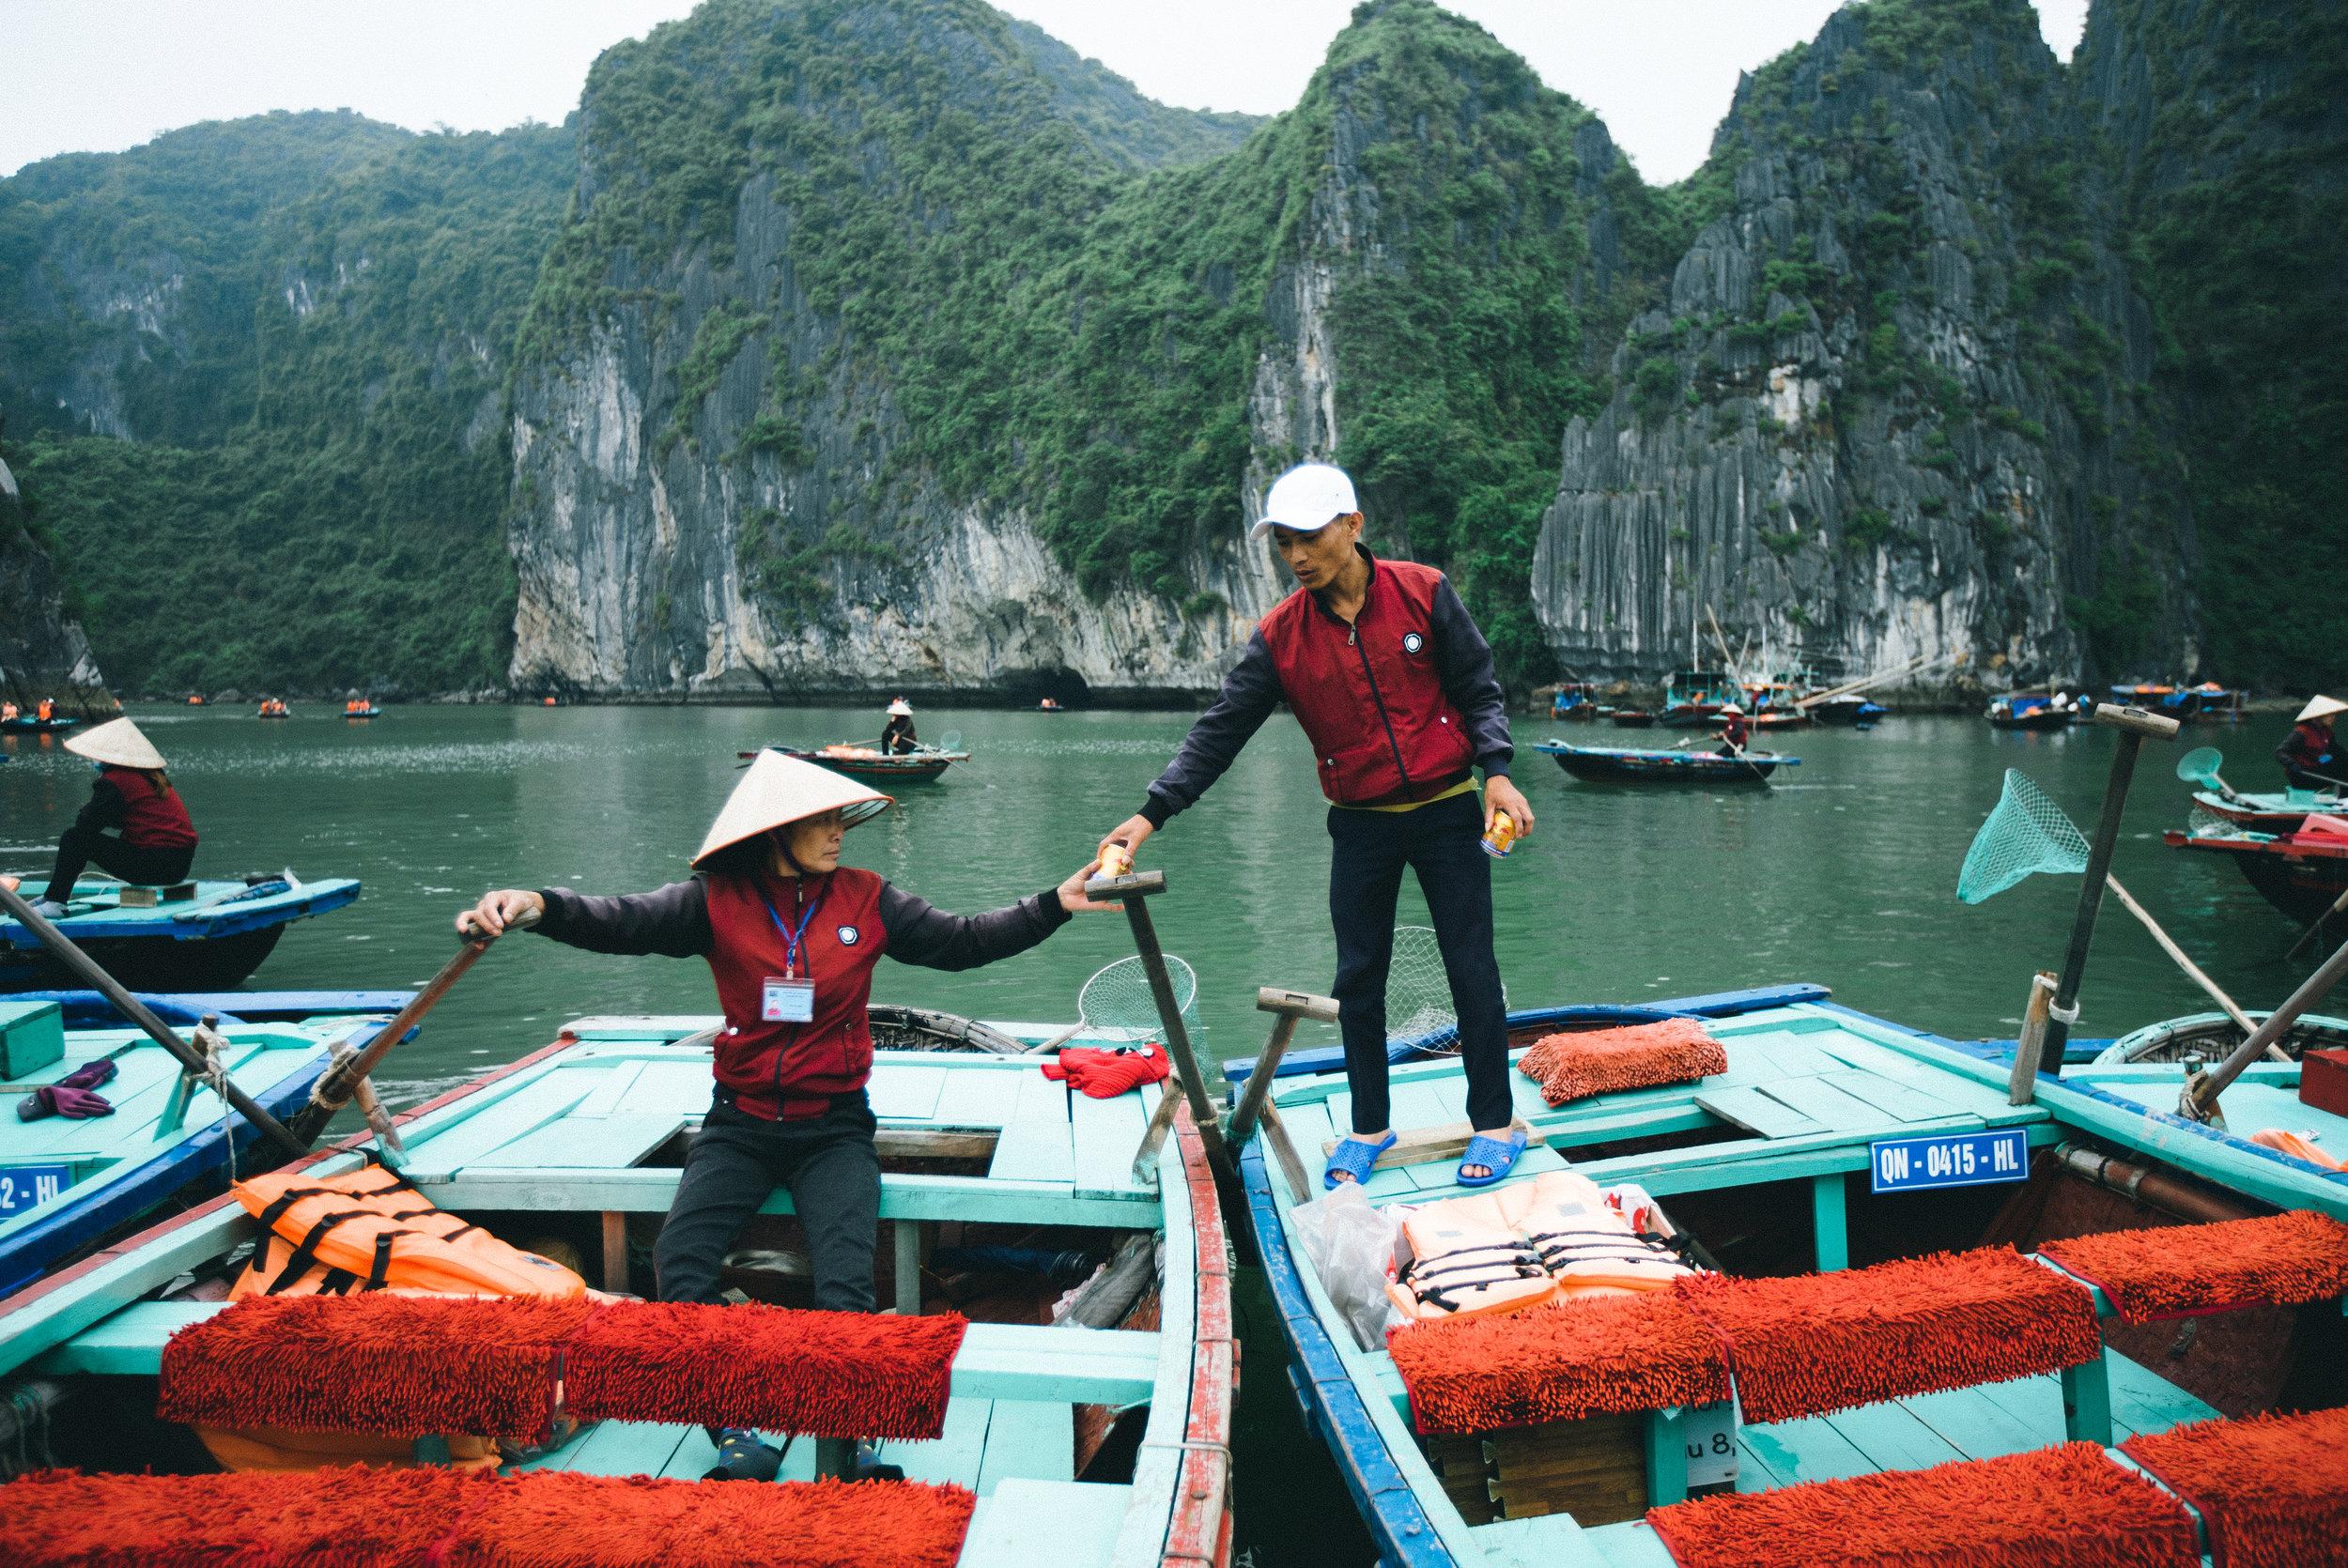 20170424_Vietnam_00043.jpg